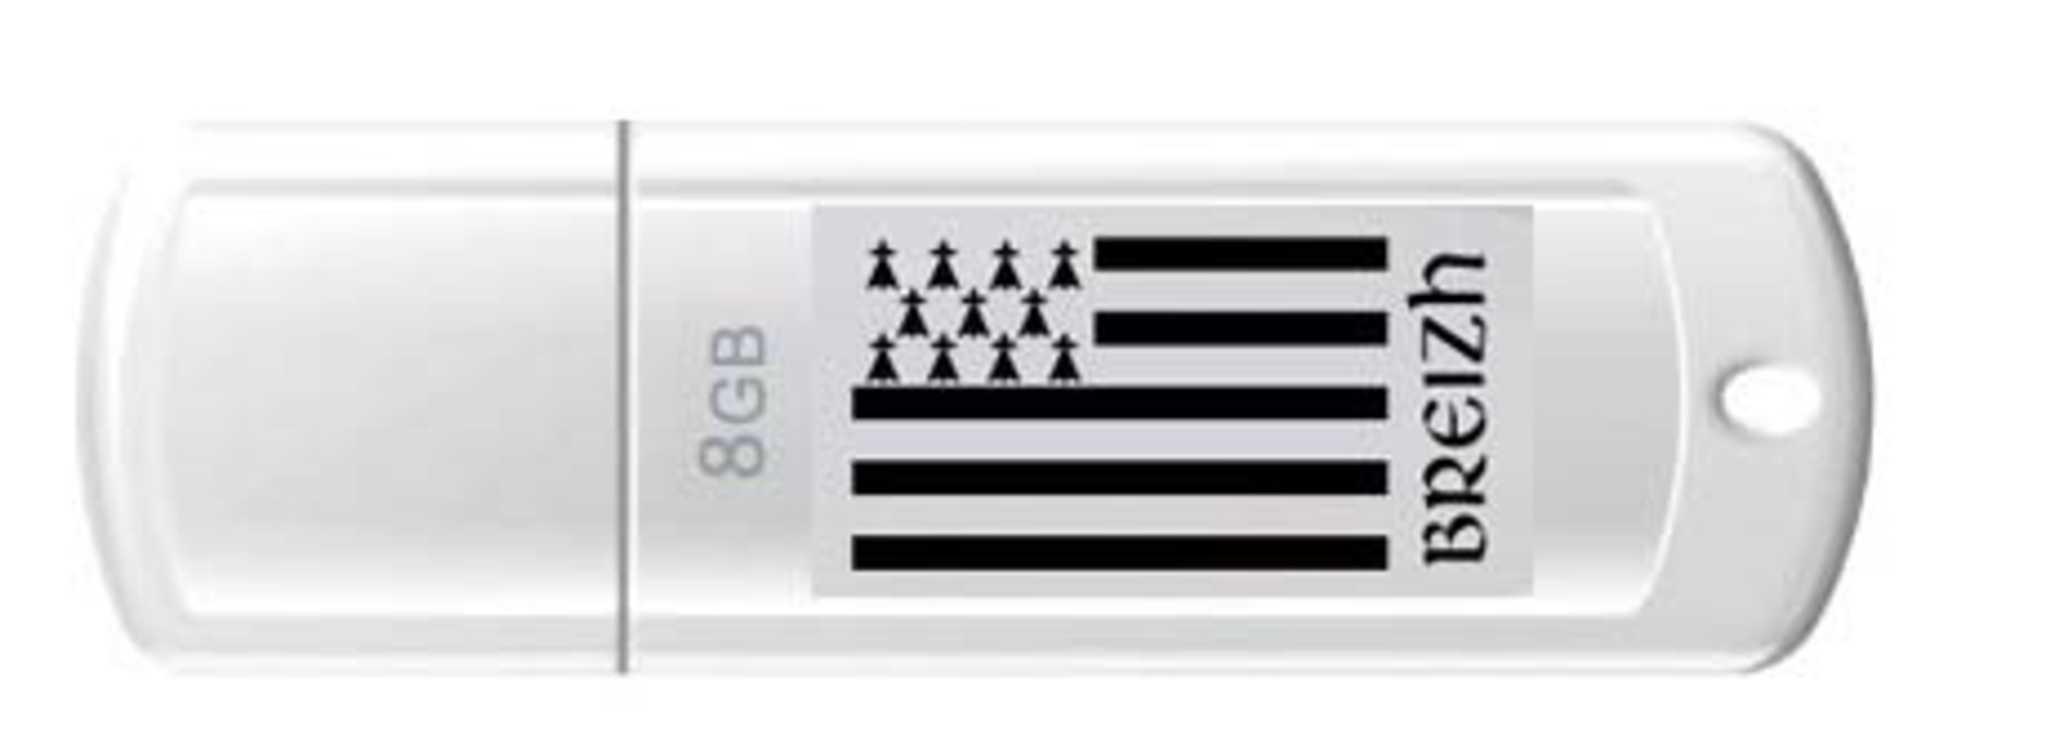 CLE USB 8 GO SERIE 370 BLANC GLOSSY USB 2.0 LOGO BZH 0